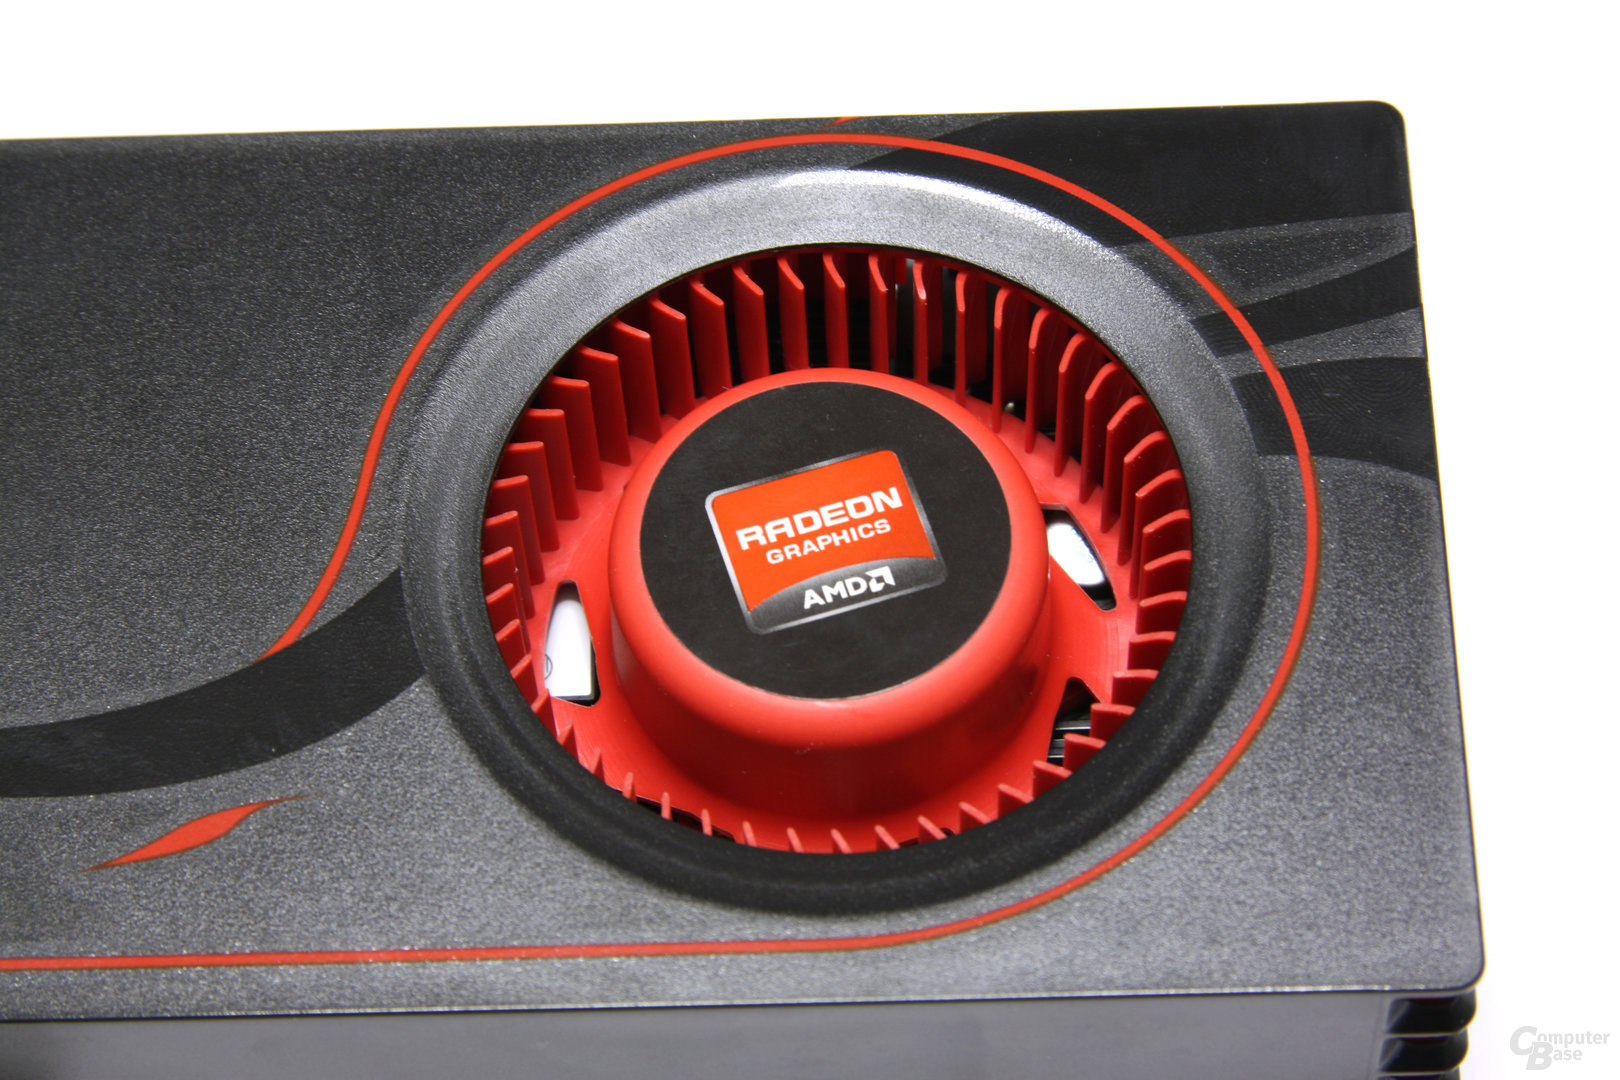 Radeon HD 6970 Lüfter